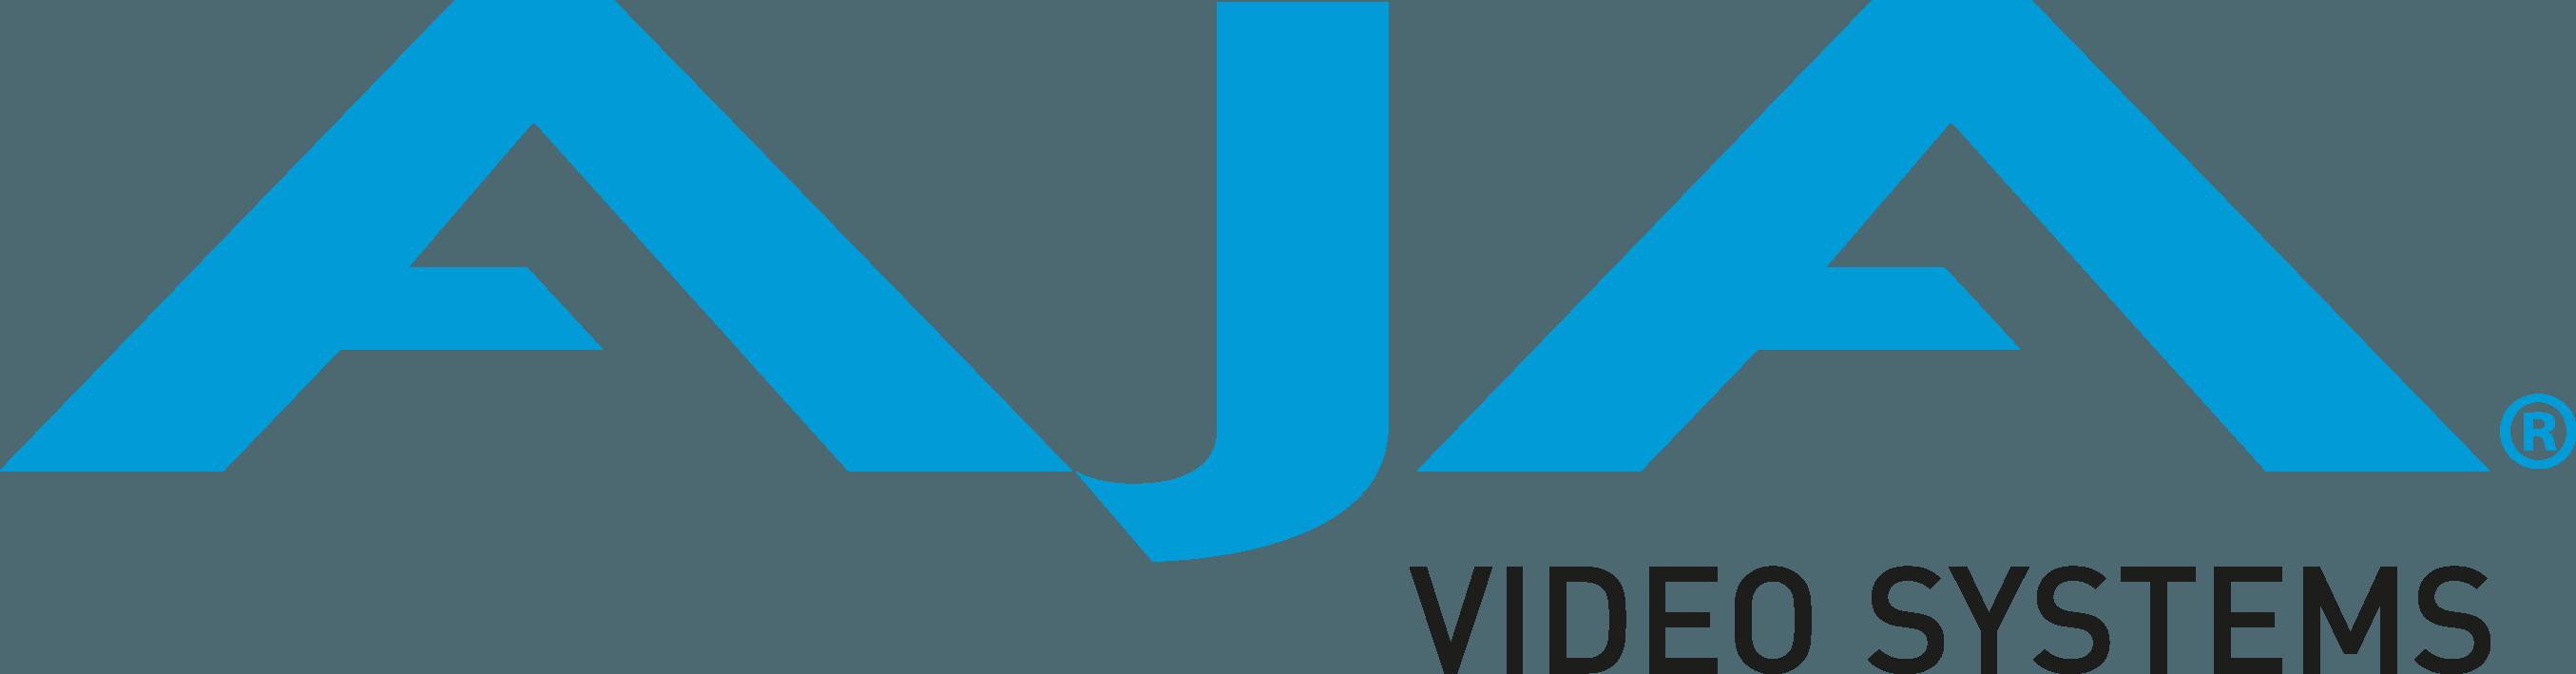 AJA Logo png